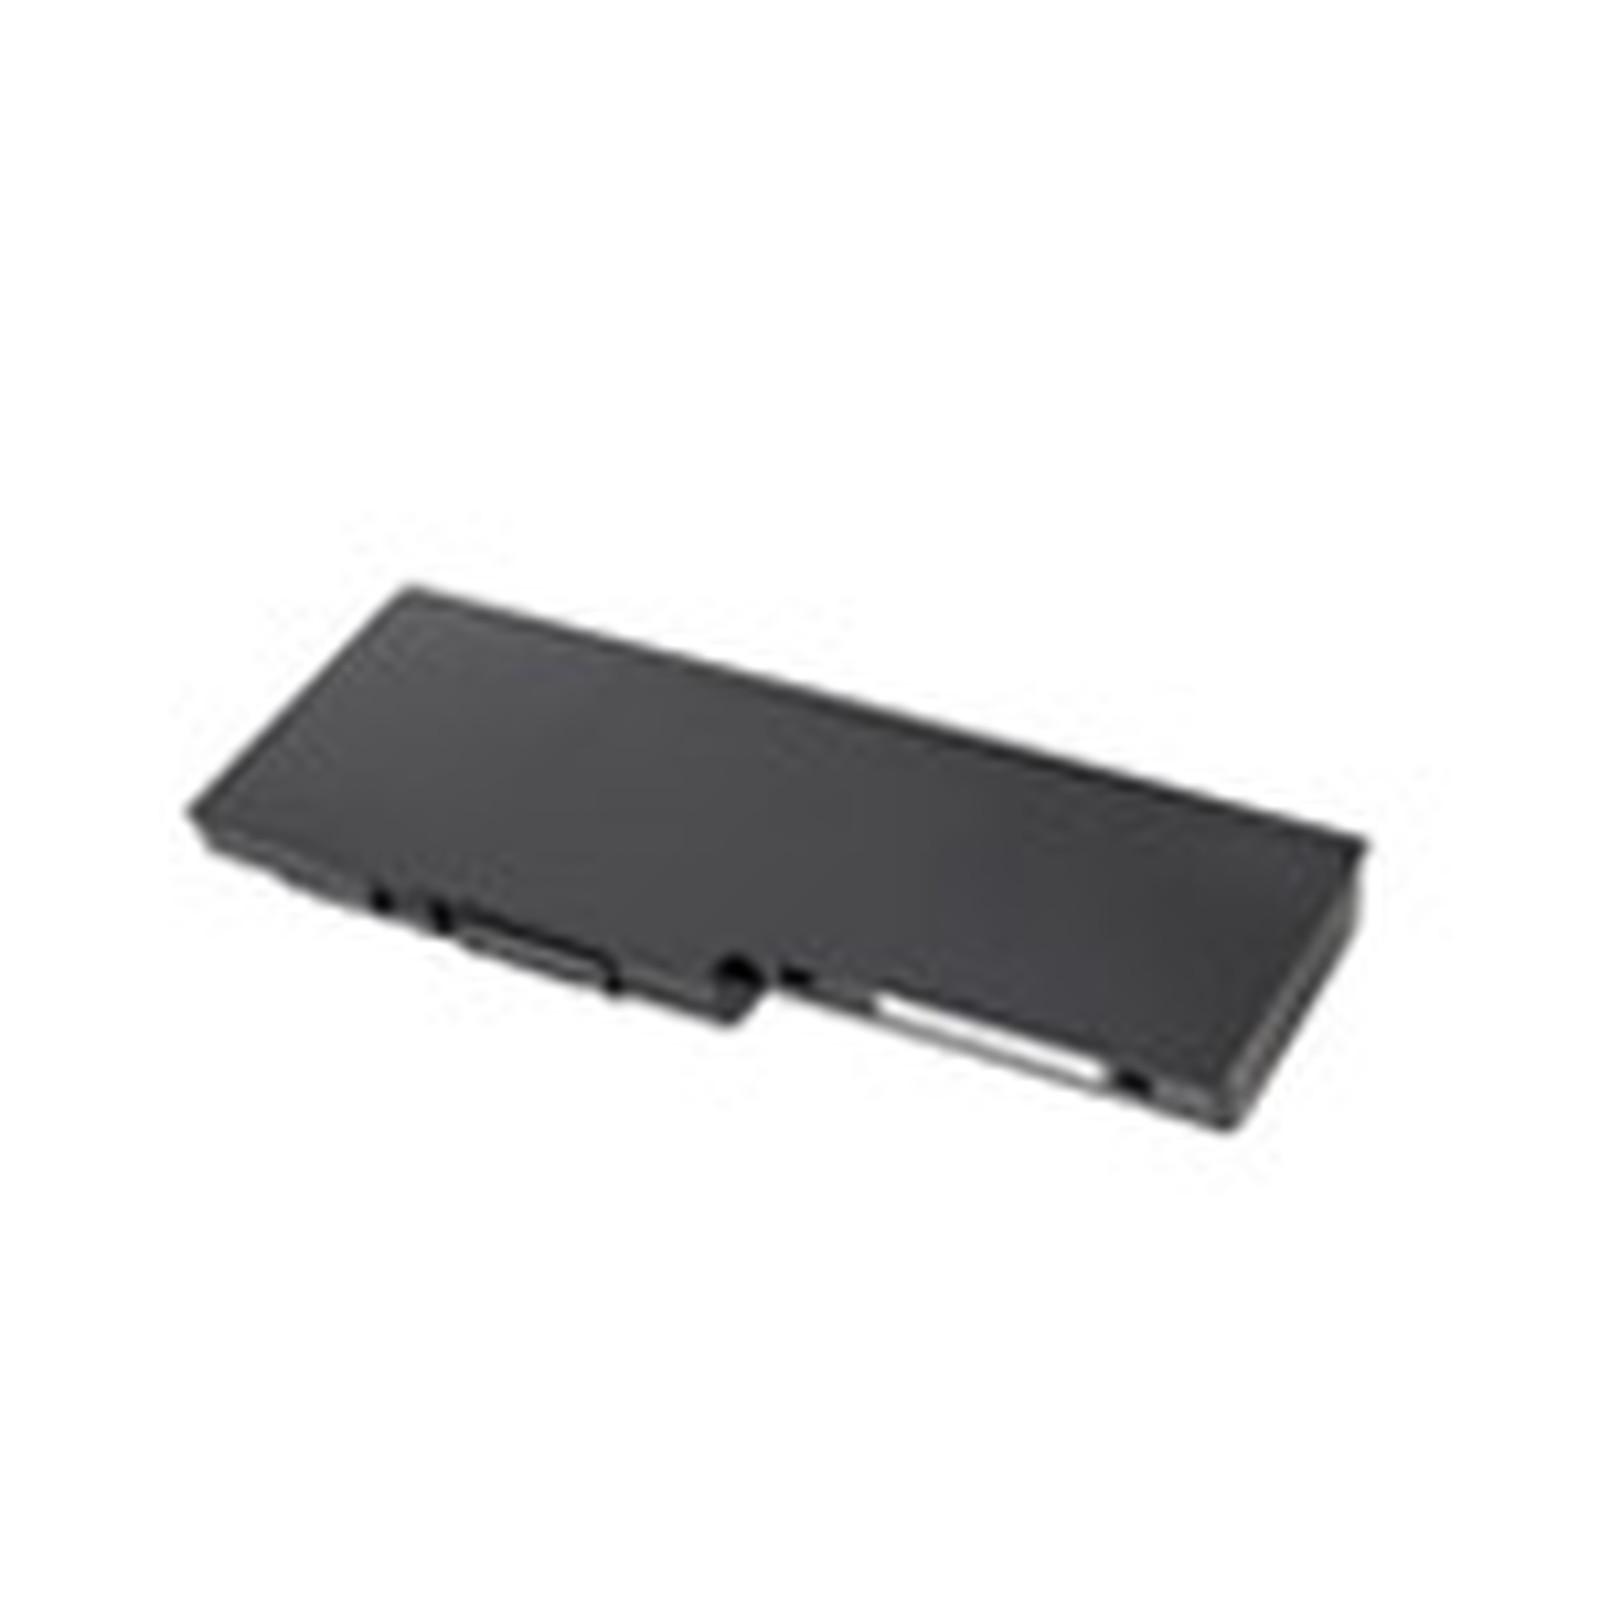 Toshiba Batterie Principale Ion-Lithium 9 Cellules 6000 mAh